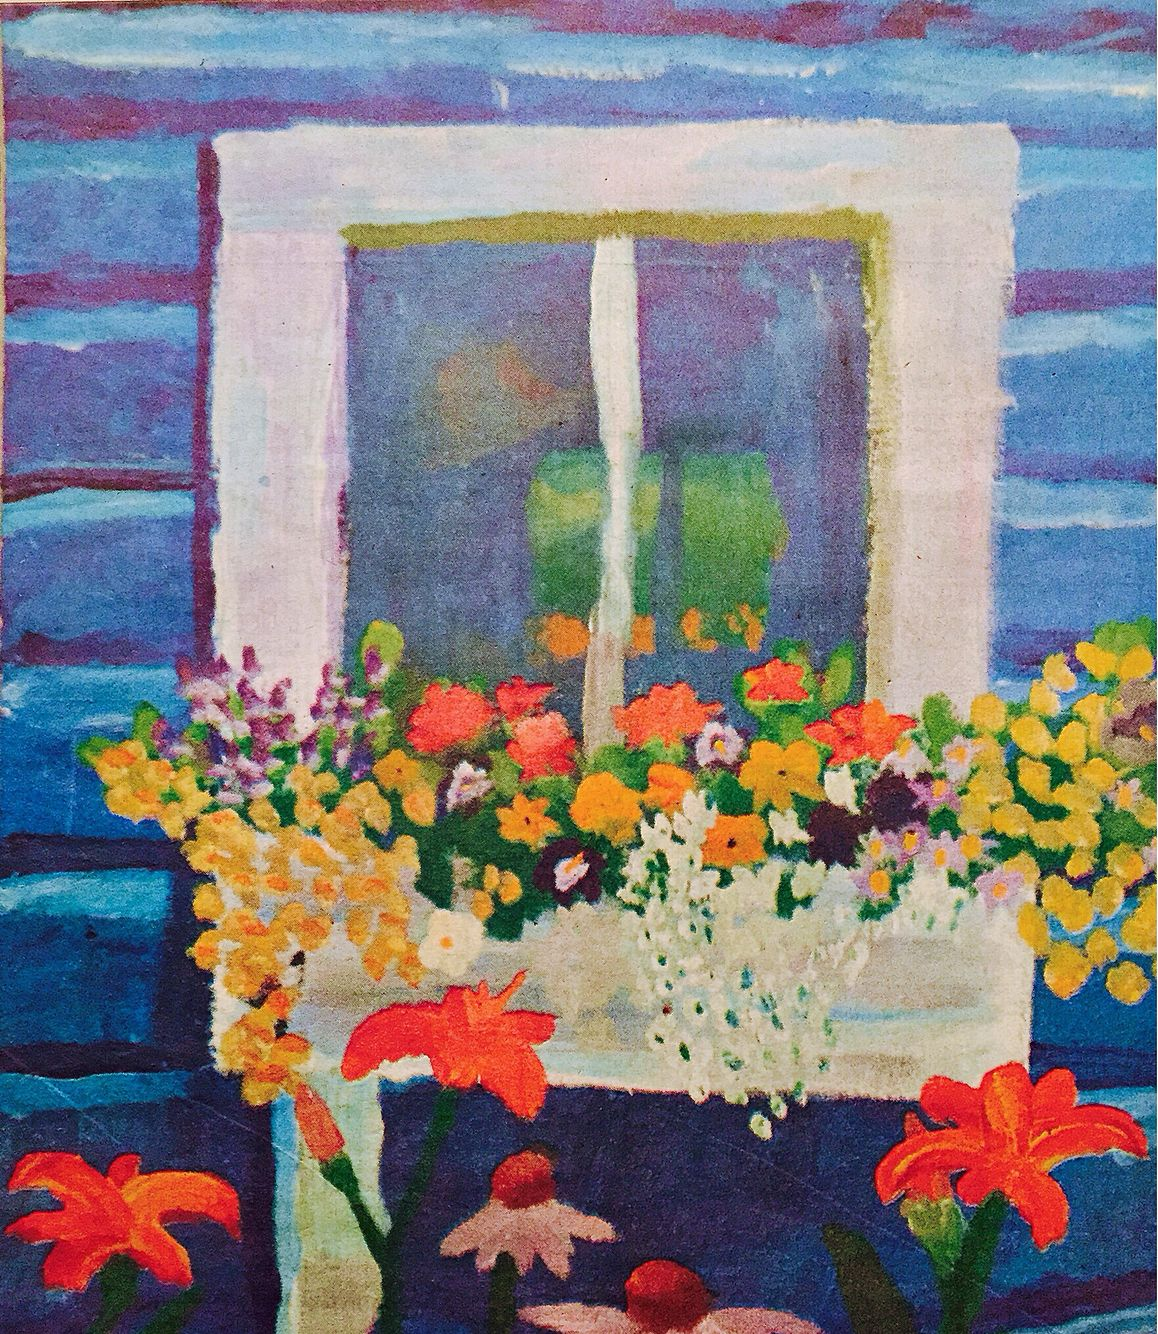 Olivia's Flowerbox | Olivia Apergis, 2009 | impressionism with acrylics